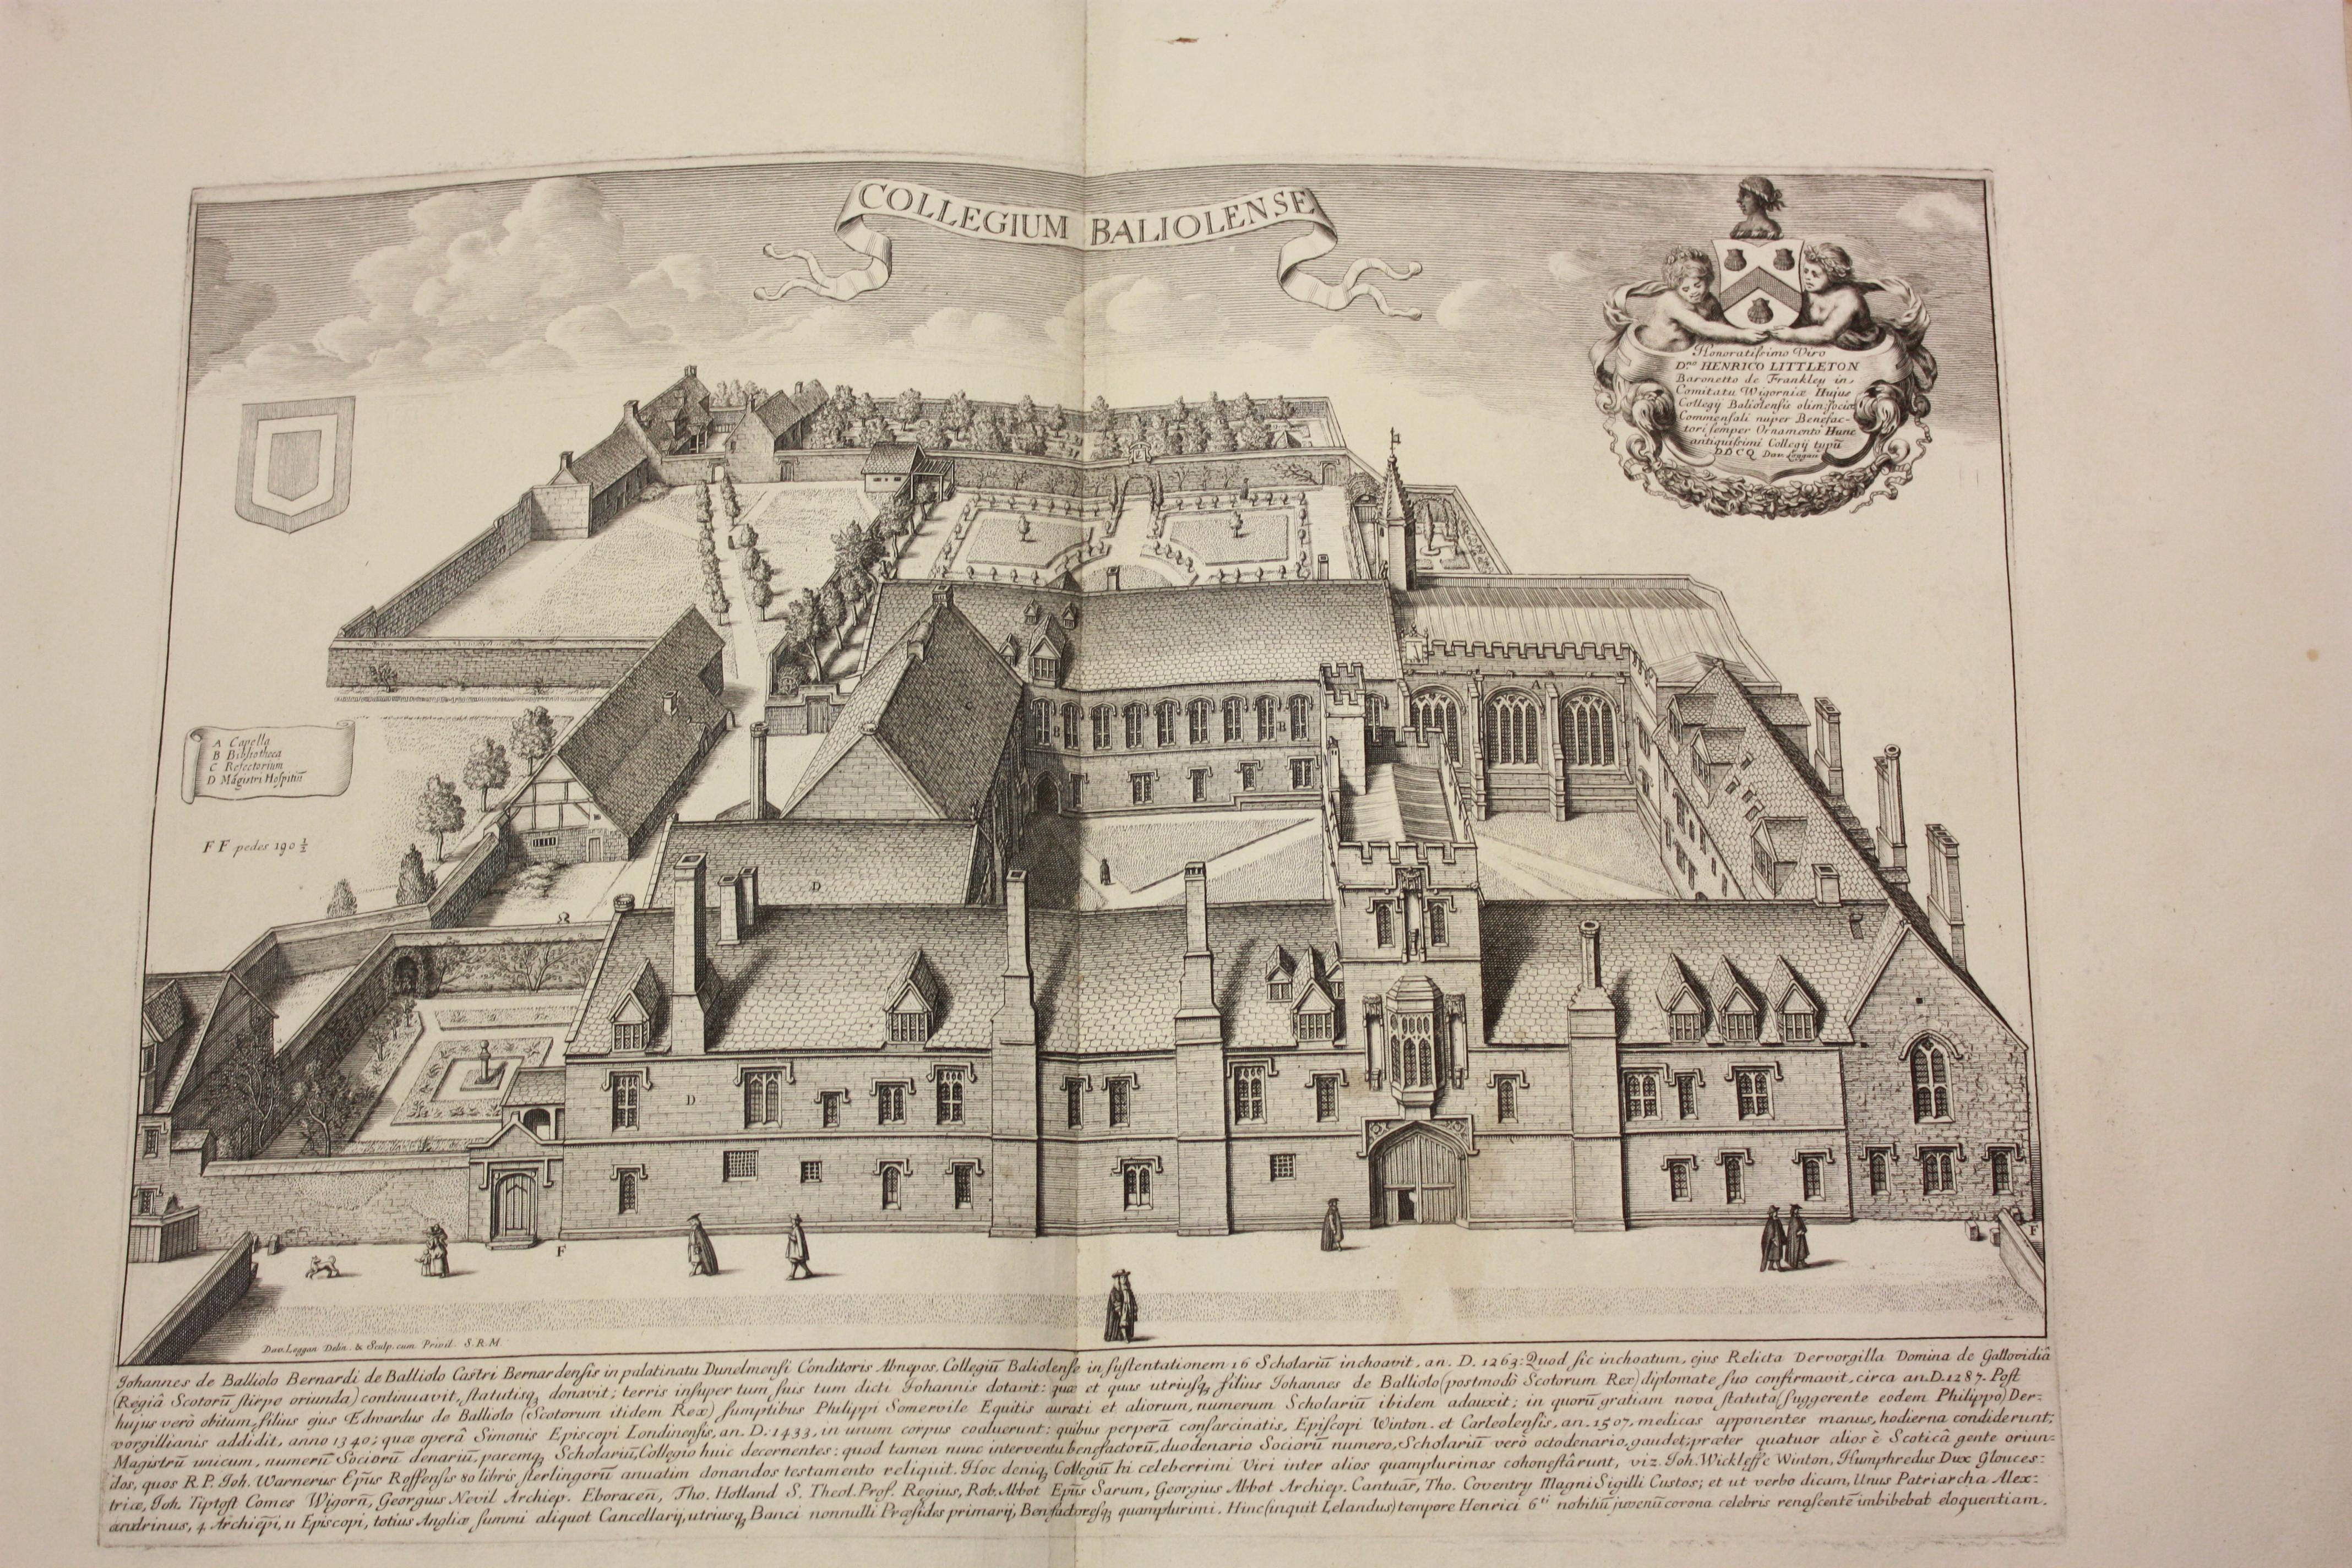 30-g-62-Plate of Balliol in 17th century